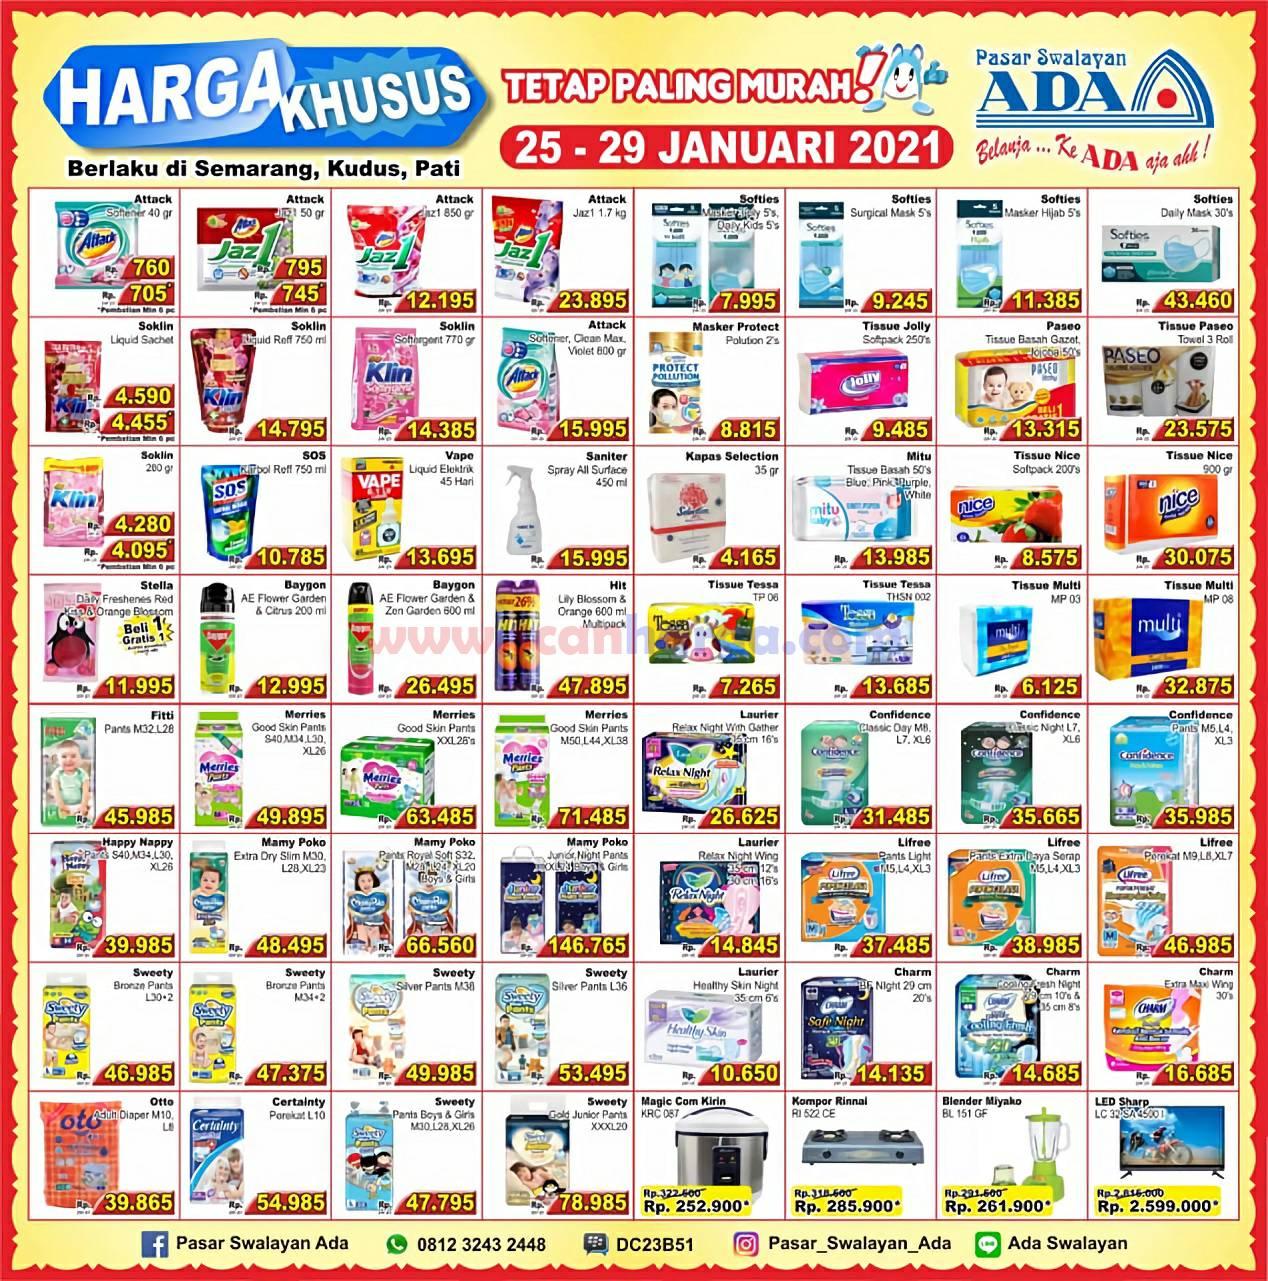 Promo Katalog Ada Swalayan Weekday Harga Khusus 25 - 29 Januari 2021 2